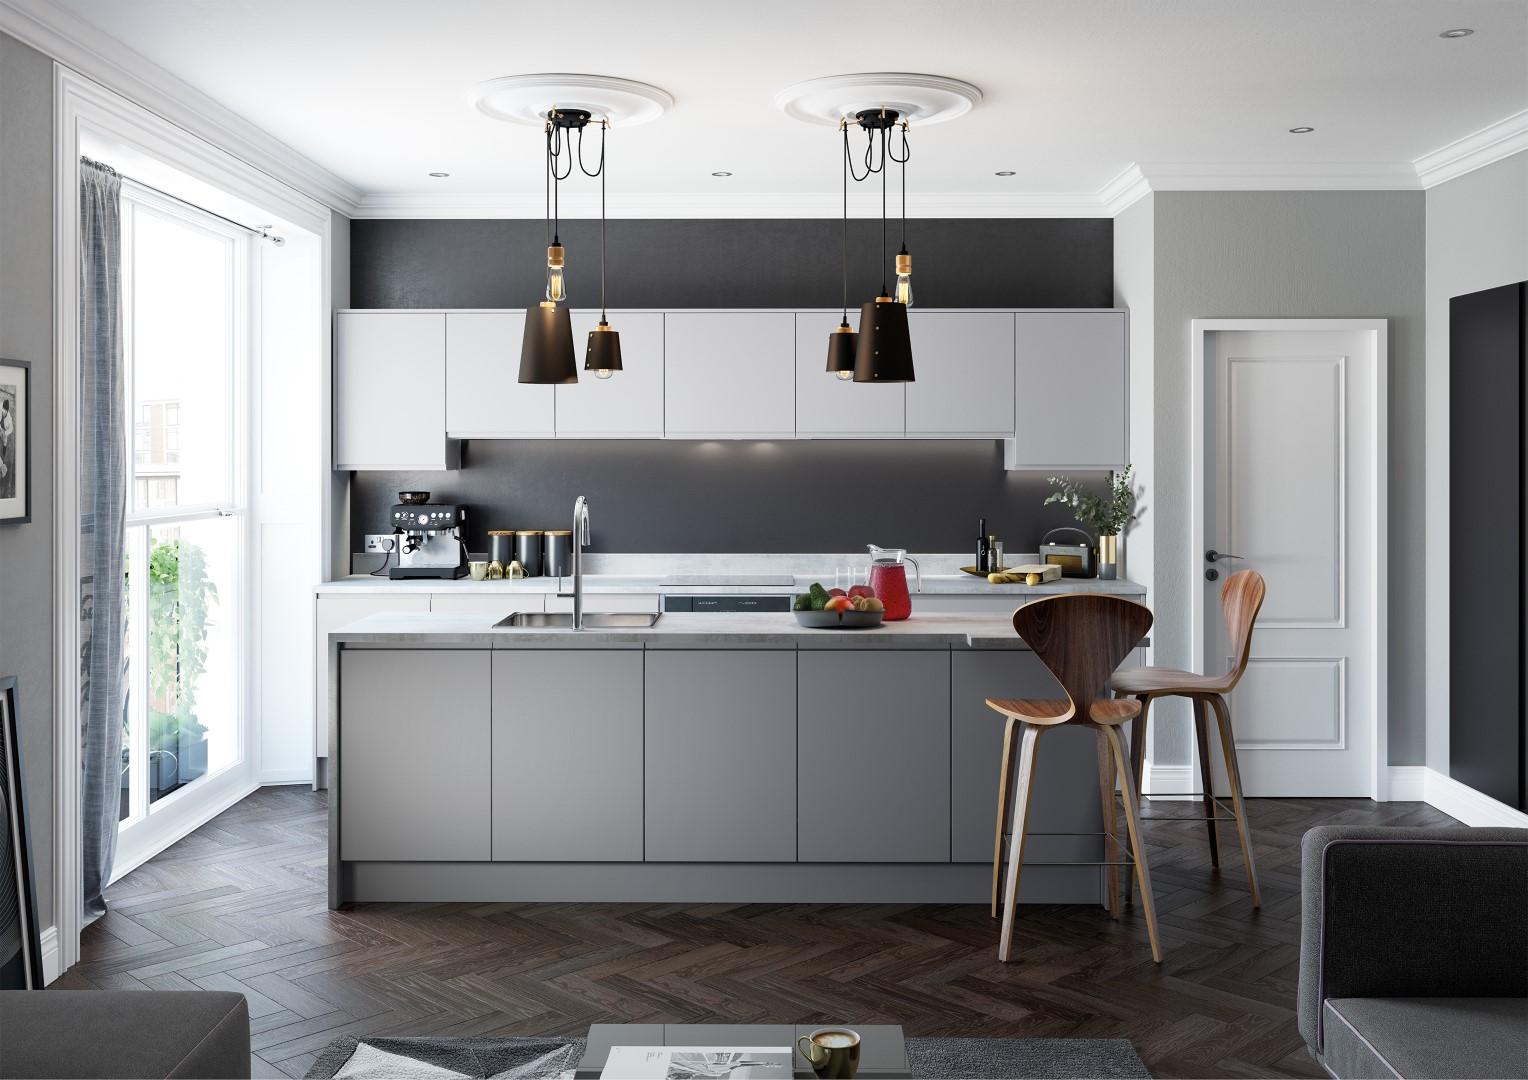 Strada Matte Light Grey and Dust Grey - Kitchen Design - Alan Kelly Kitchens - Waterford - 4